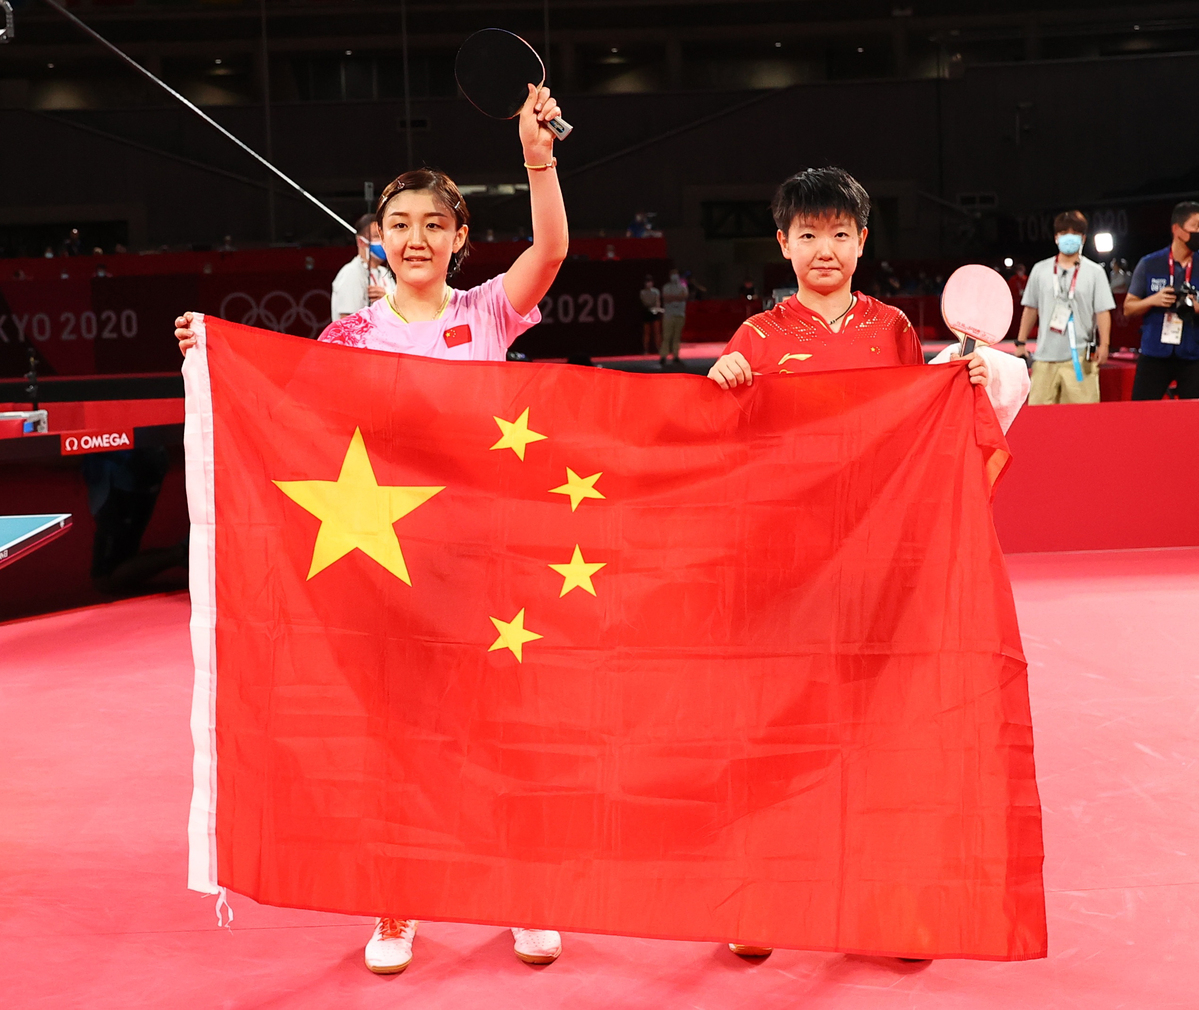 The 2020 Tokyo Olympics Thread-61034c1ea310efa1e3b2977c-jpeg